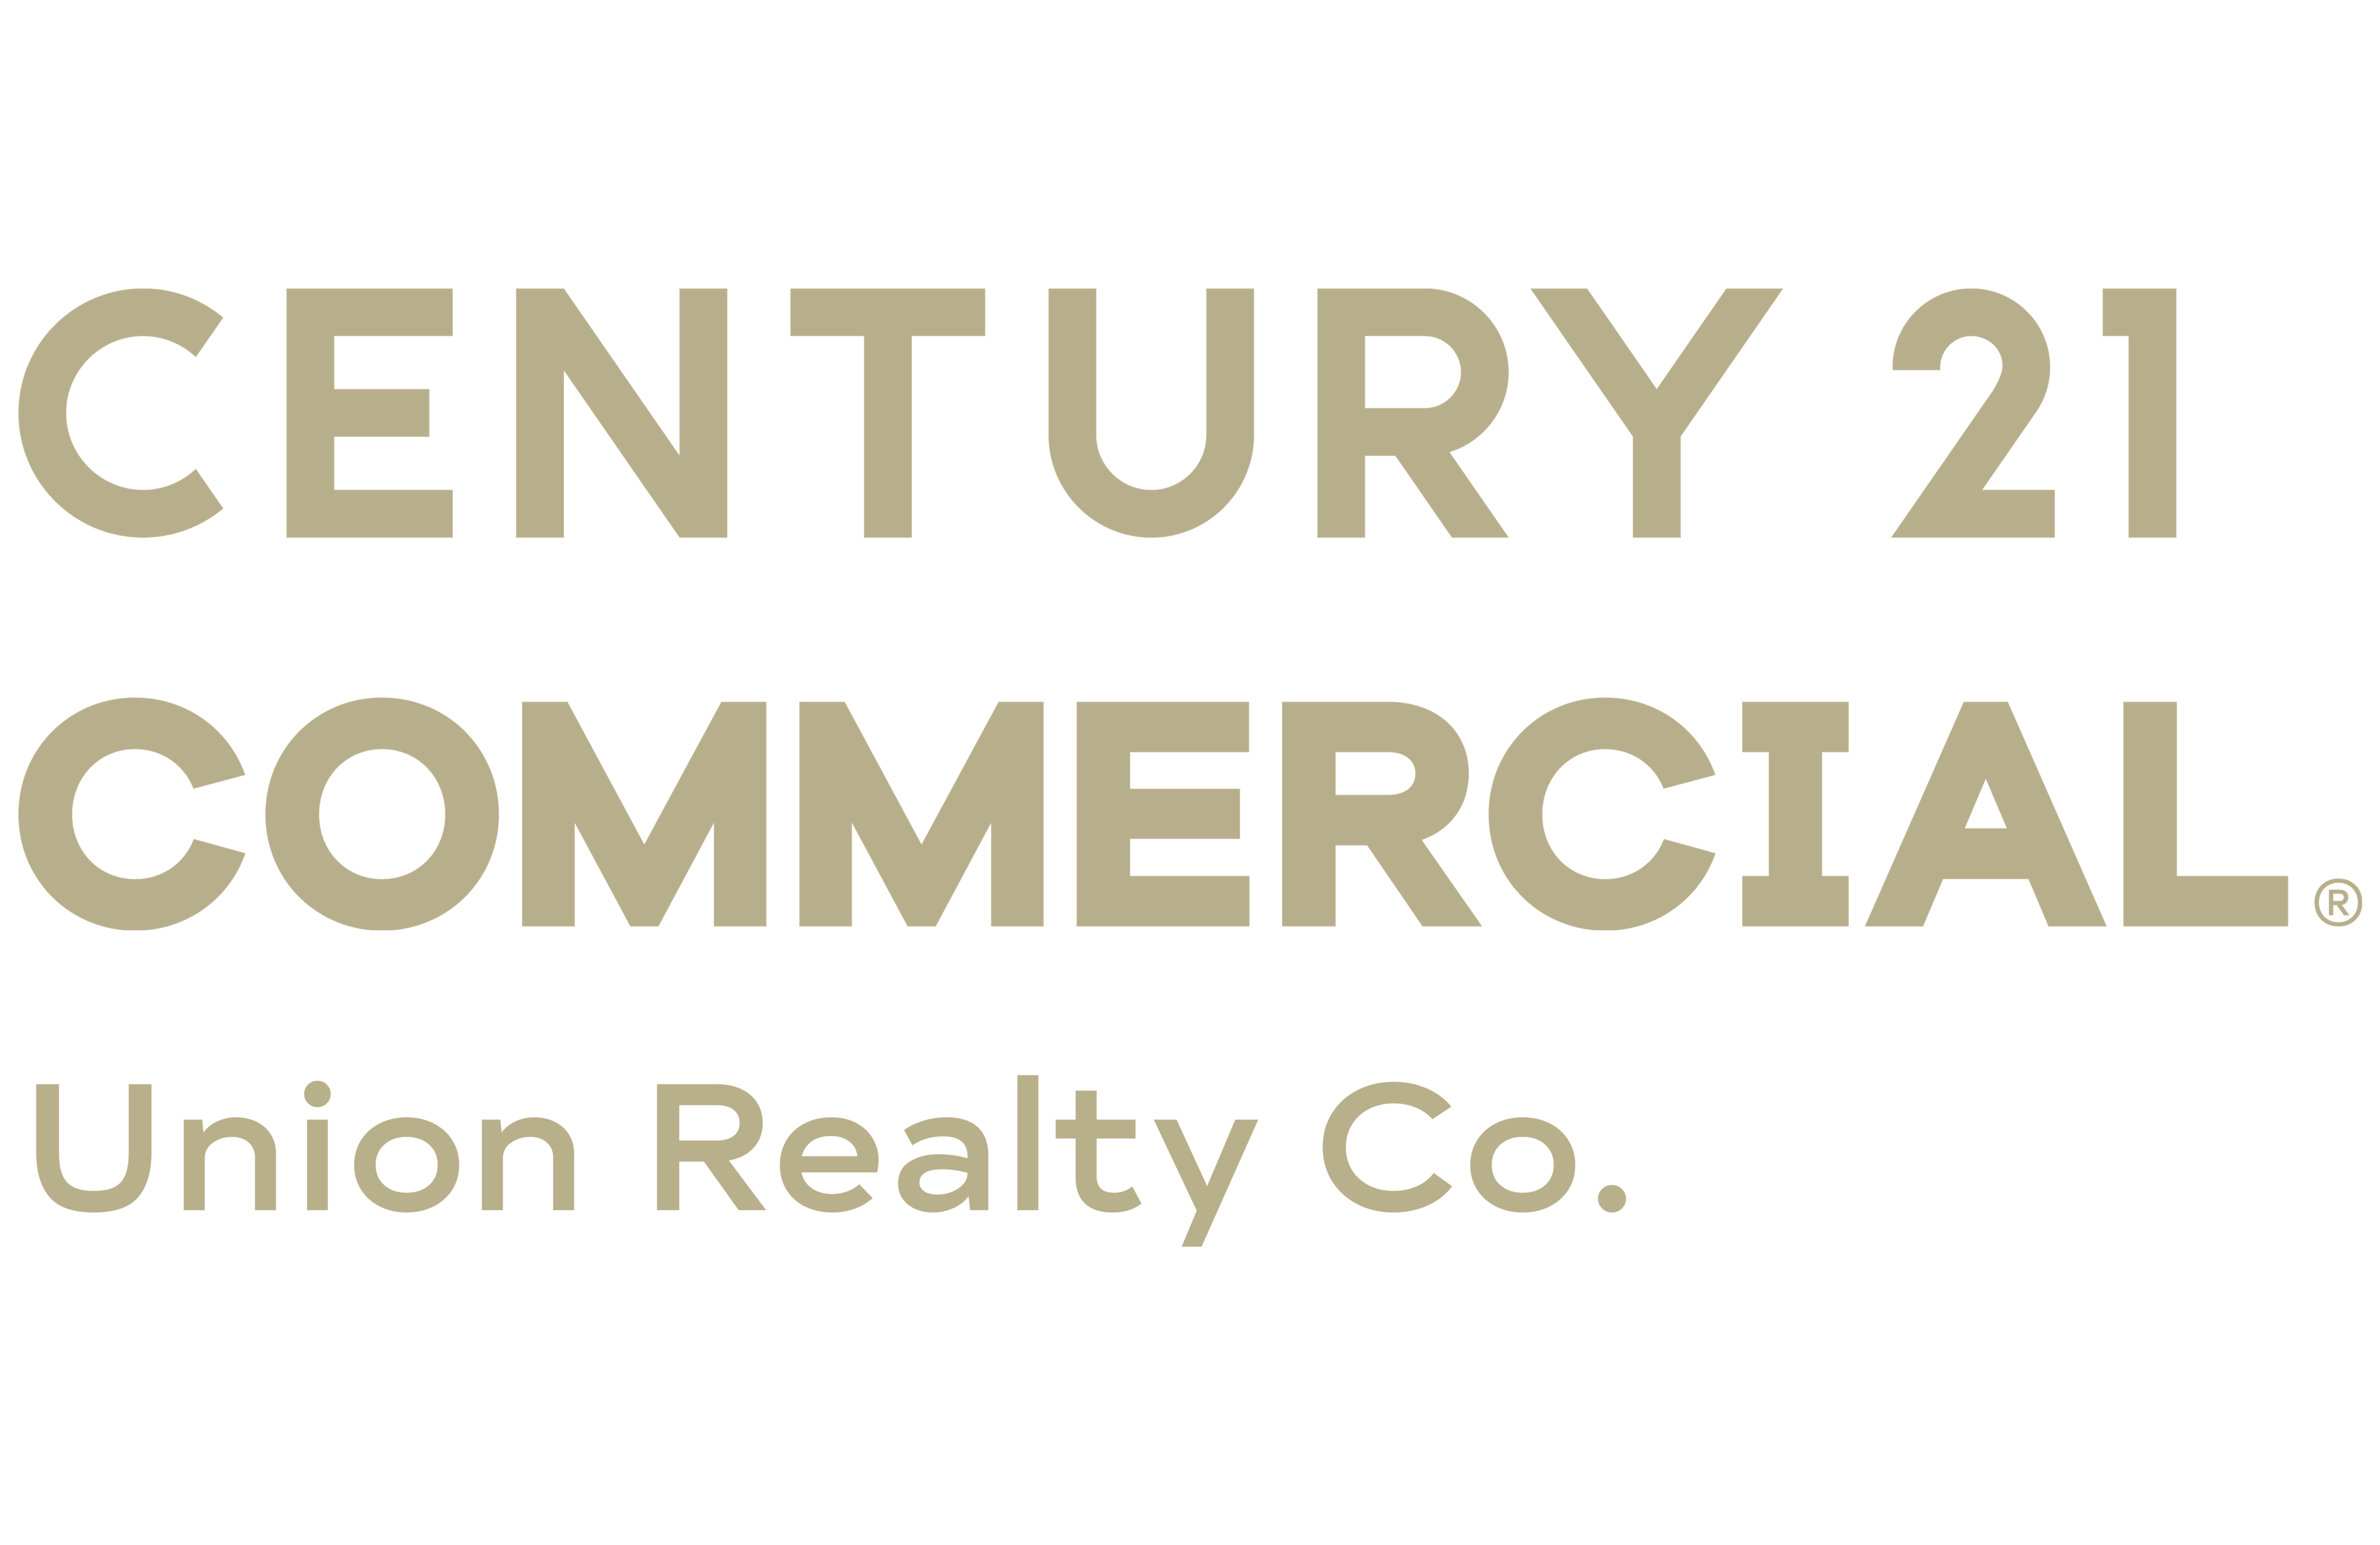 Vishesh Sharma of CENTURY 21 Union Realty Co. logo